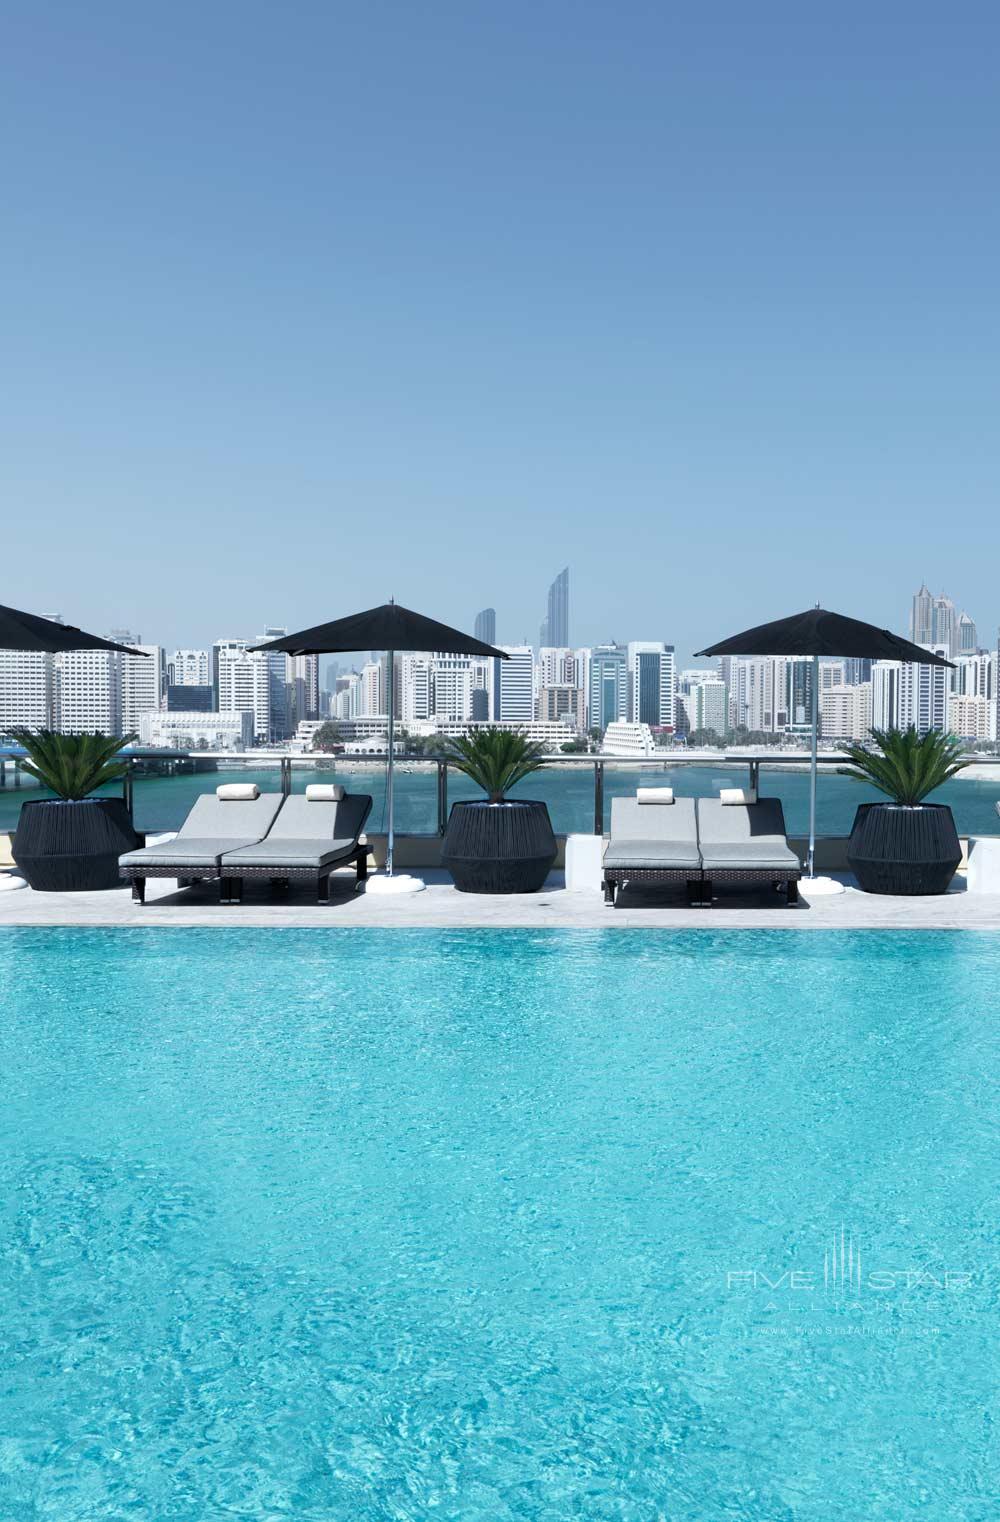 Outdoor Pool at Four Seasons Abu Dhabi, United Arab Emirates